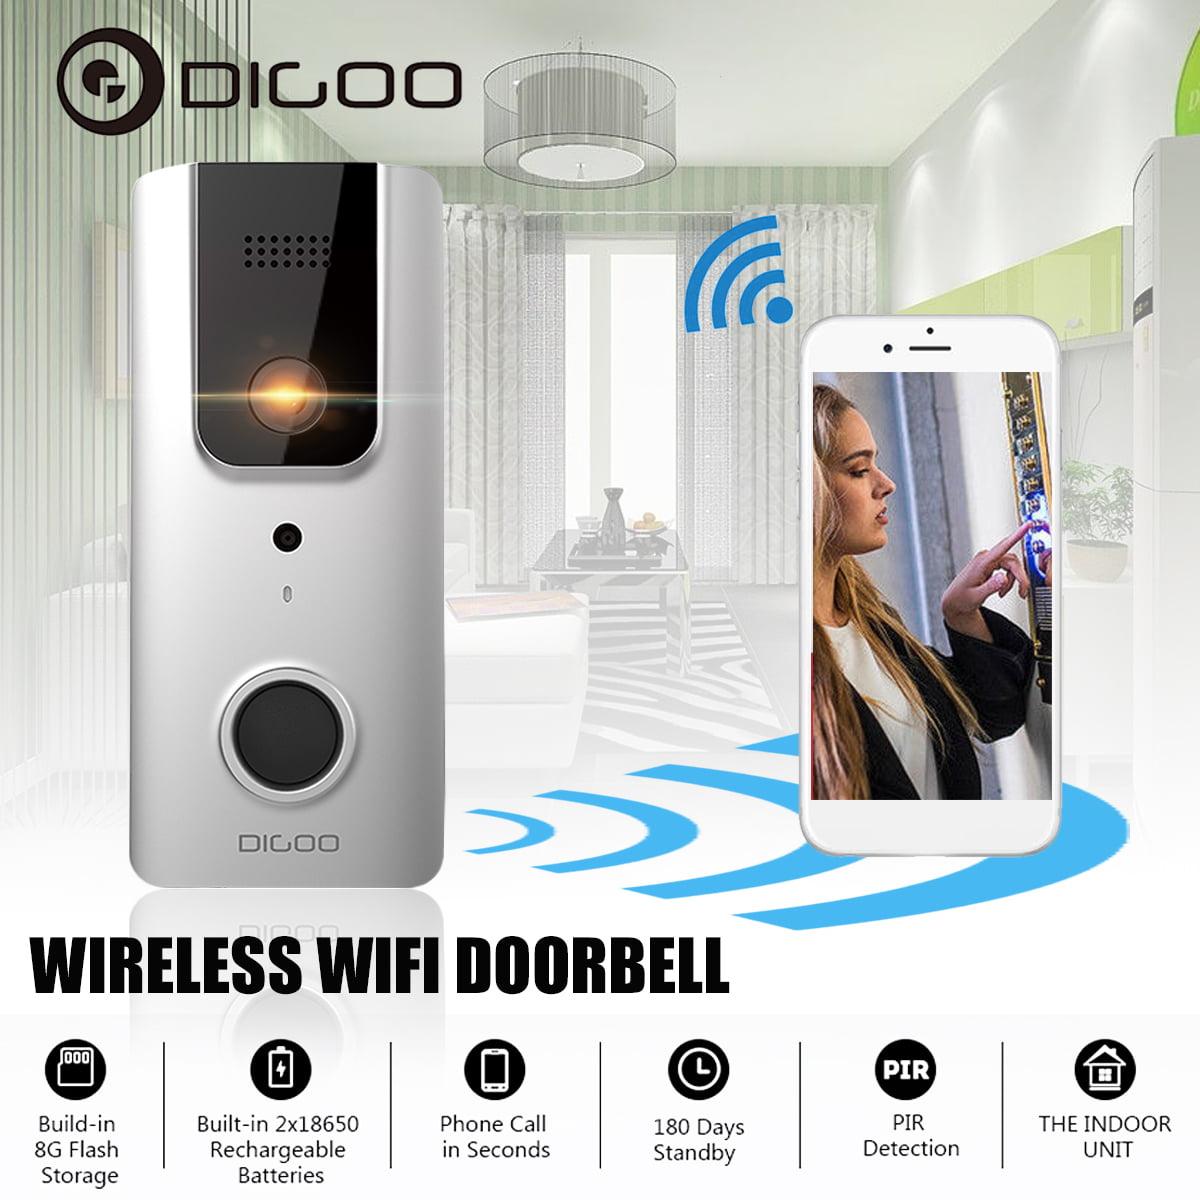 【New Upgrade】DIGOO SB-XYA bluetooth Wireless WIFI Ring Video Doorbell,Full HD 1080P,Pro Smart Home PIR Sensor,Camera&Phone Intercom,Rechargeable